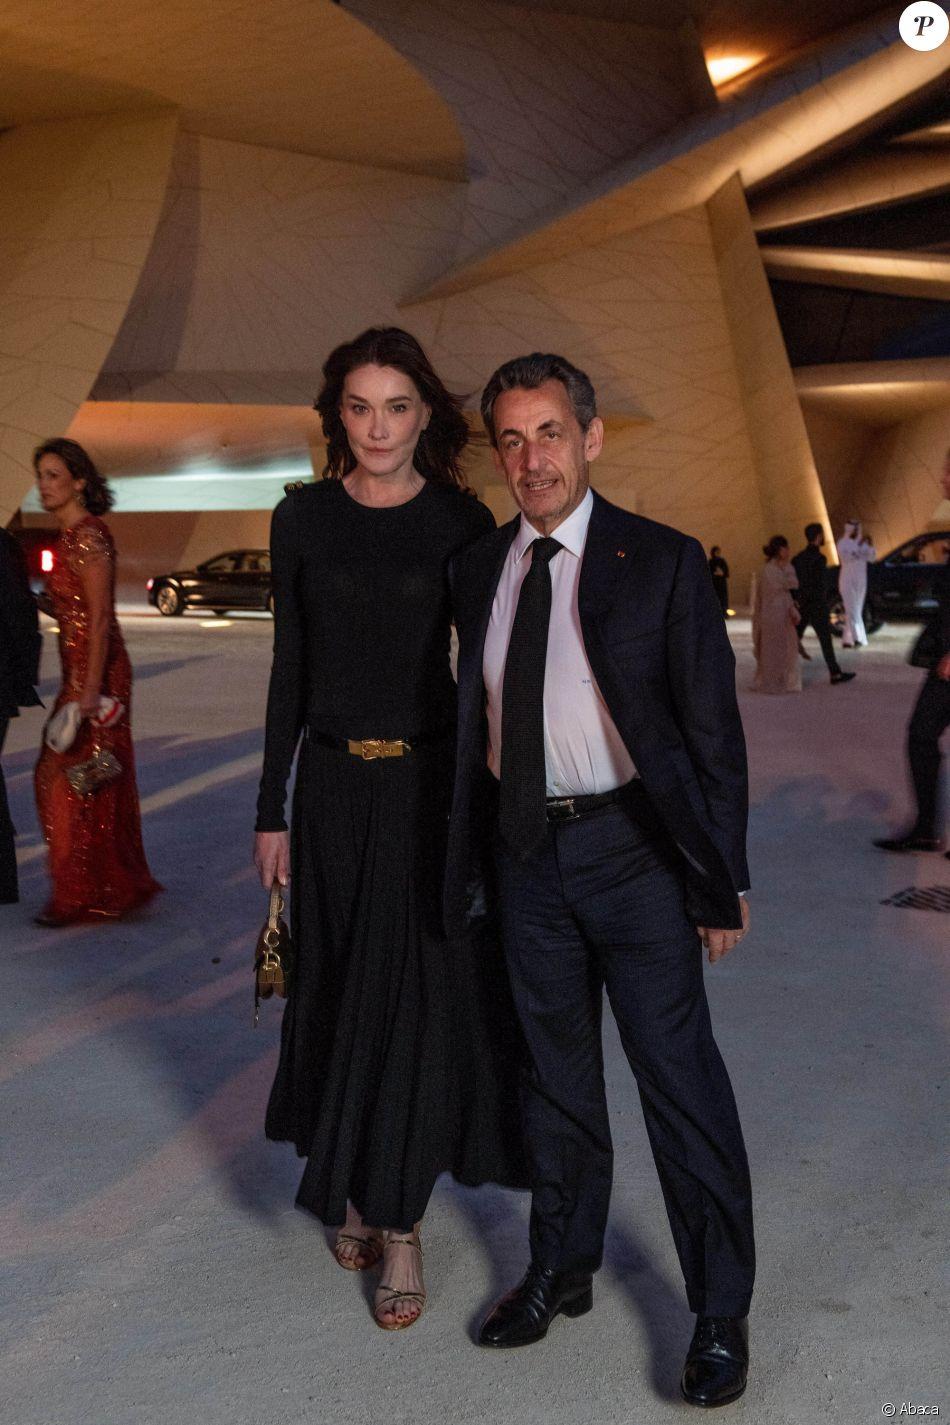 Nicolas Sarkozy et Carla Bruni-Sarkozy - Soirée d'inauguration du Musée National du Qatar. Doha, le 27 mars 2019.